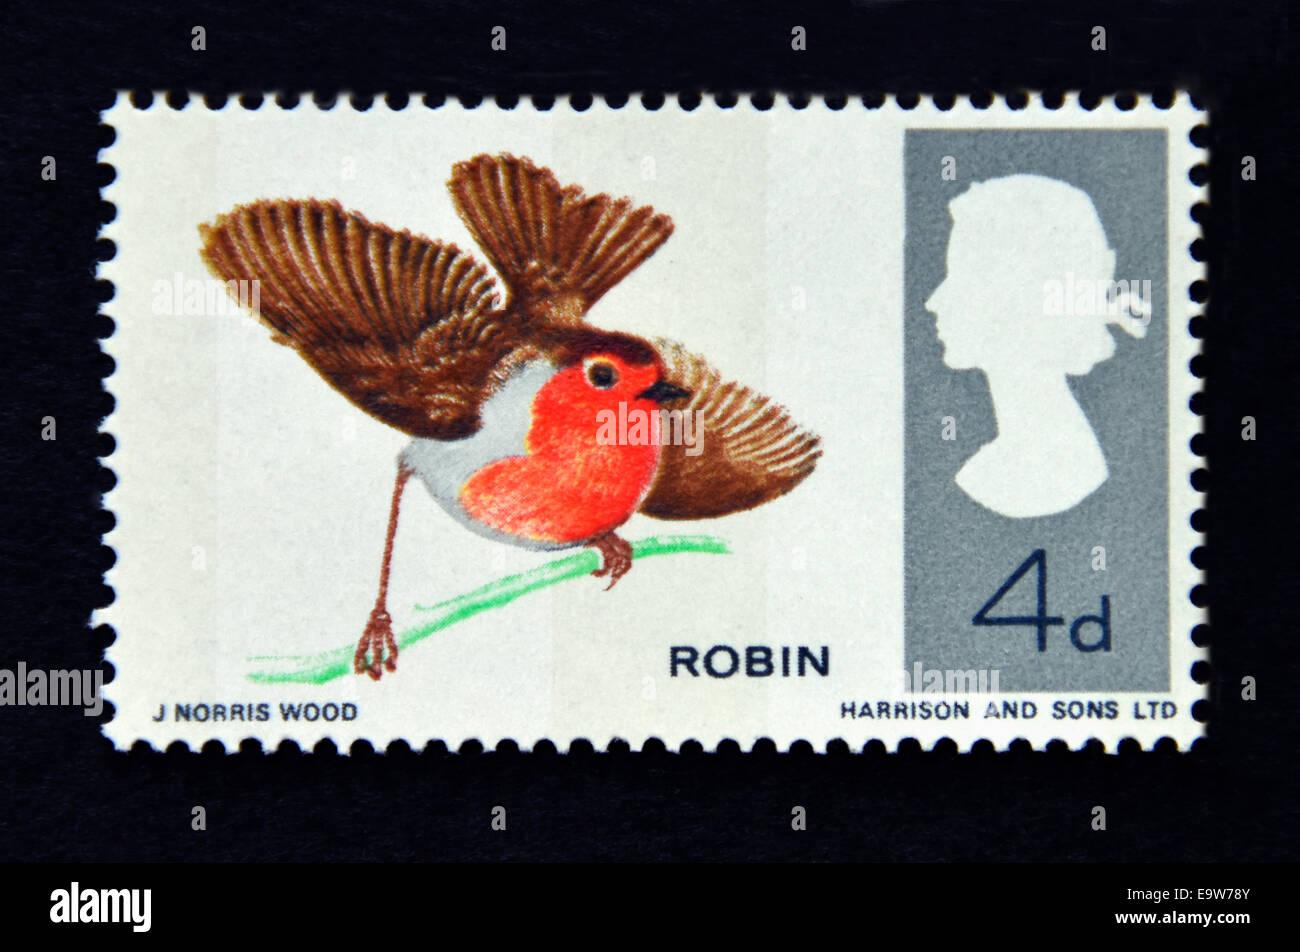 Postage stamp. Great Britain. Queen Elizabeth II. British Birds, Robin.1966. - Stock Image